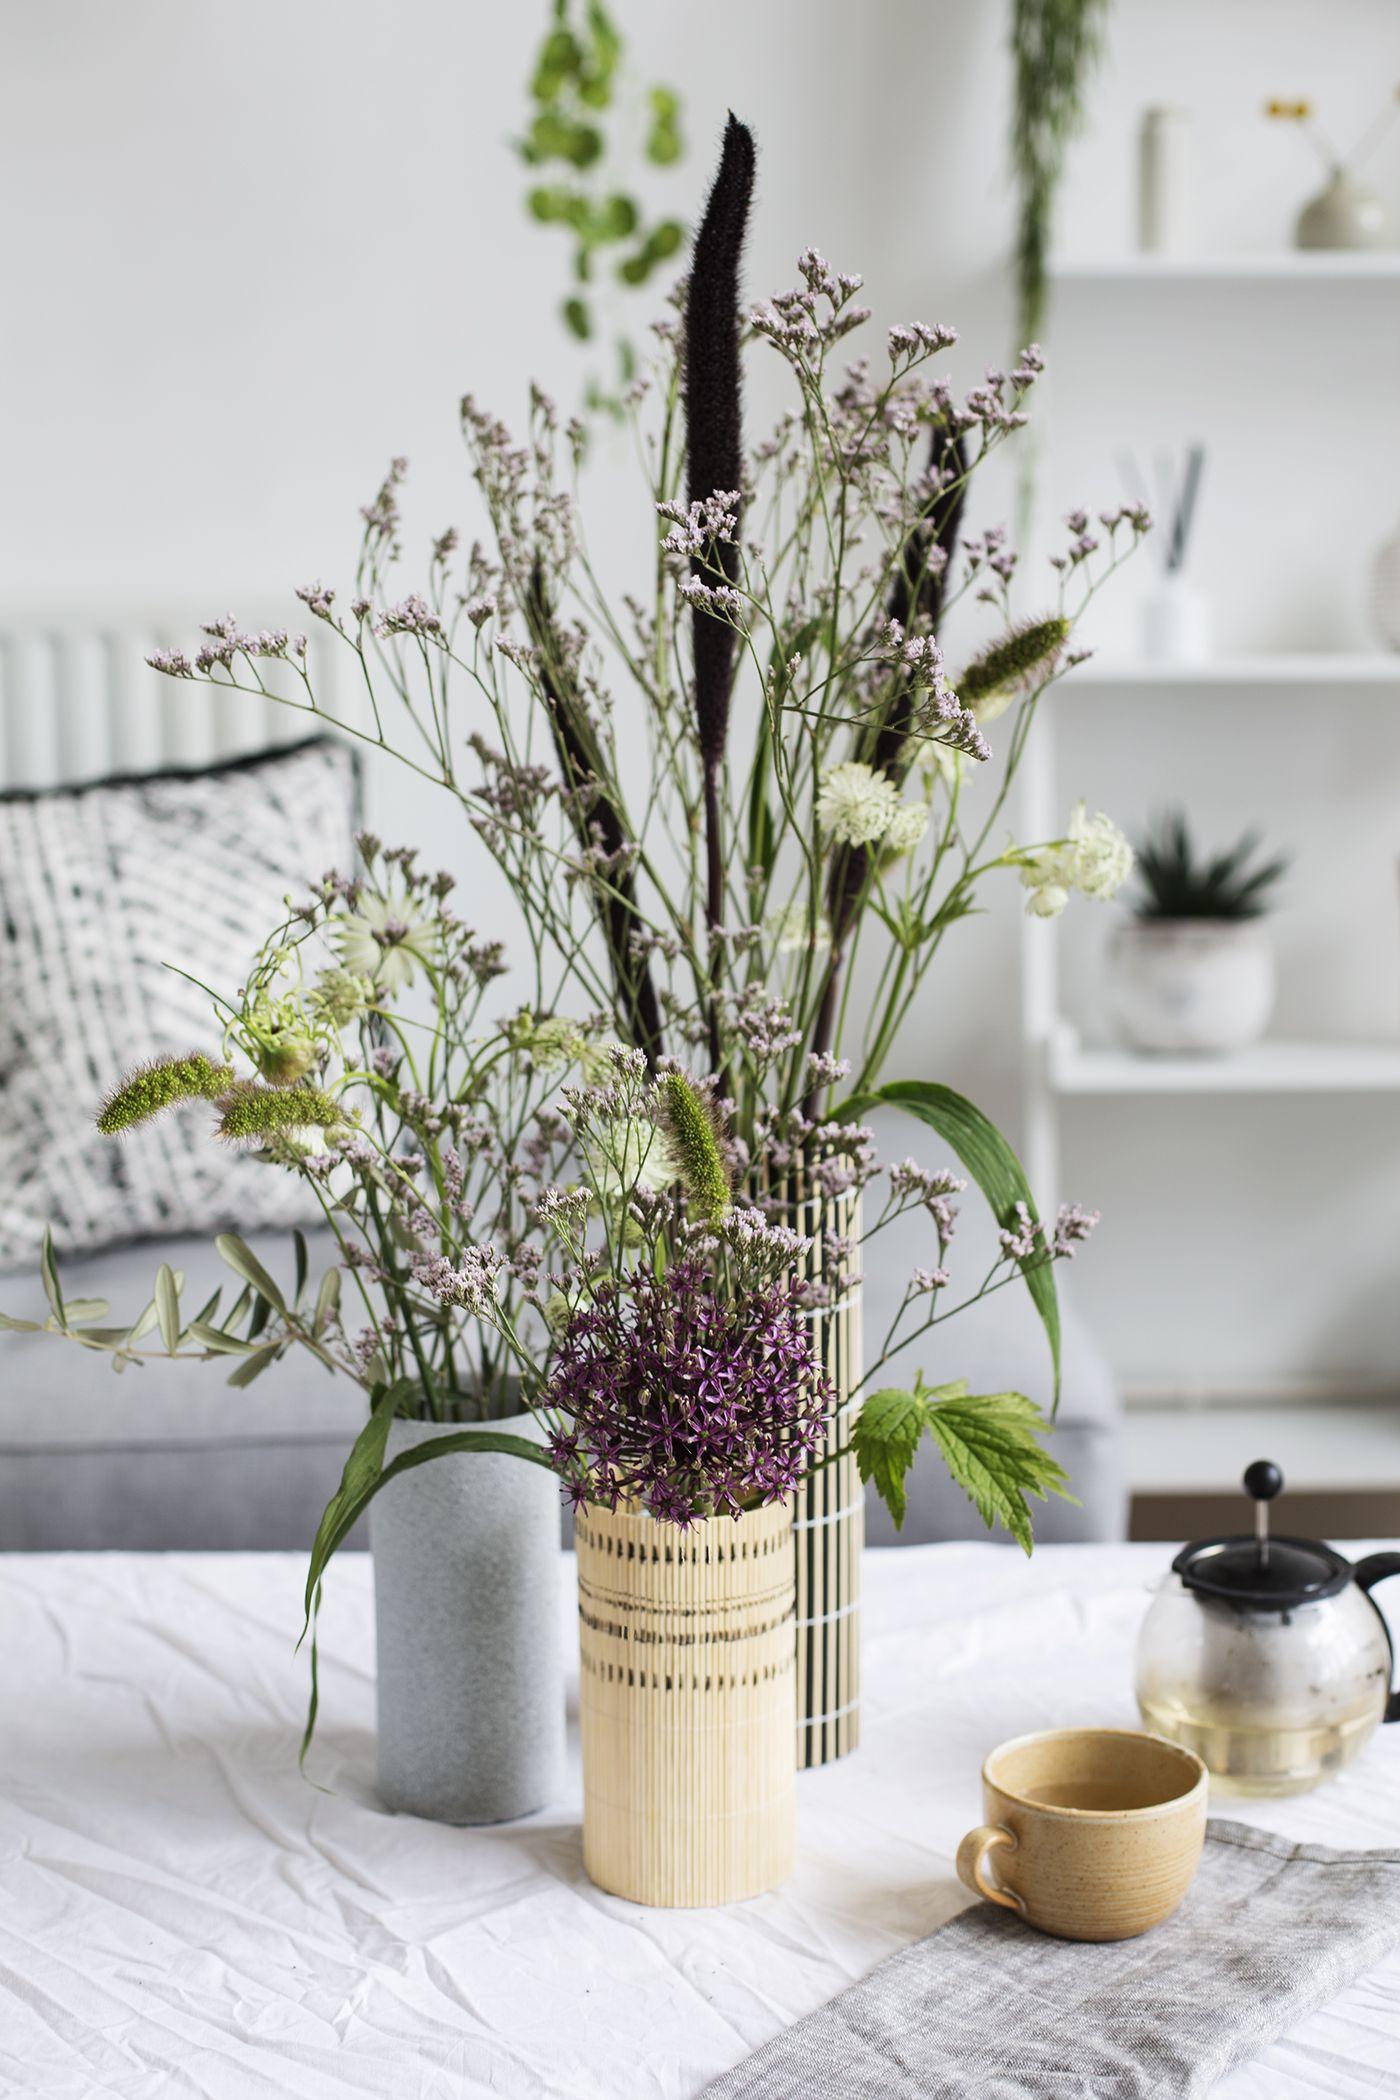 Diy decorative vases with shurgard home dec projects pinterest diy decorative vases with shurgard reviewsmspy